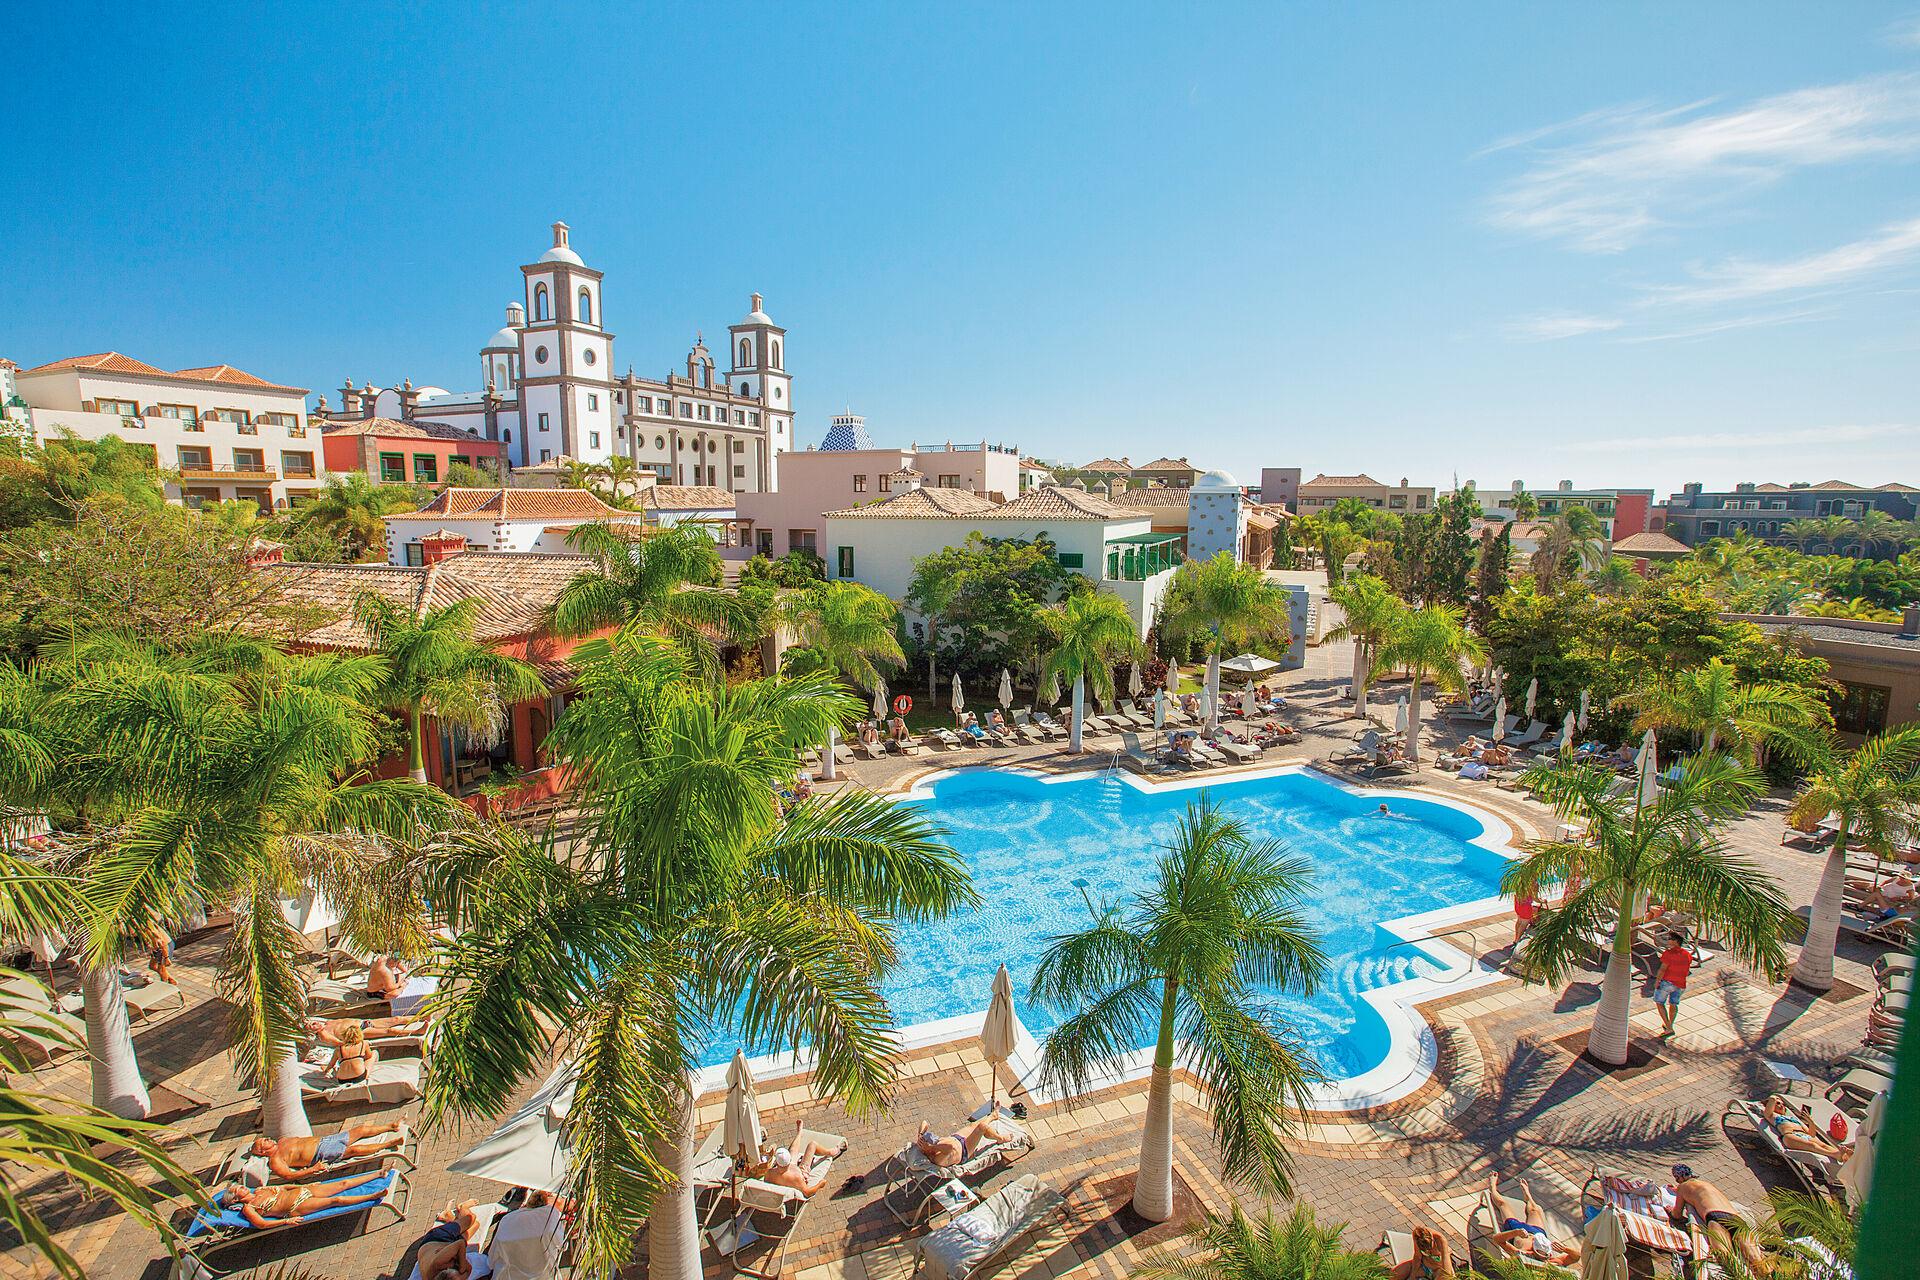 EXCLUSIVITE :  Lopesan Villa del Conde Resort & Thalasso - 5*